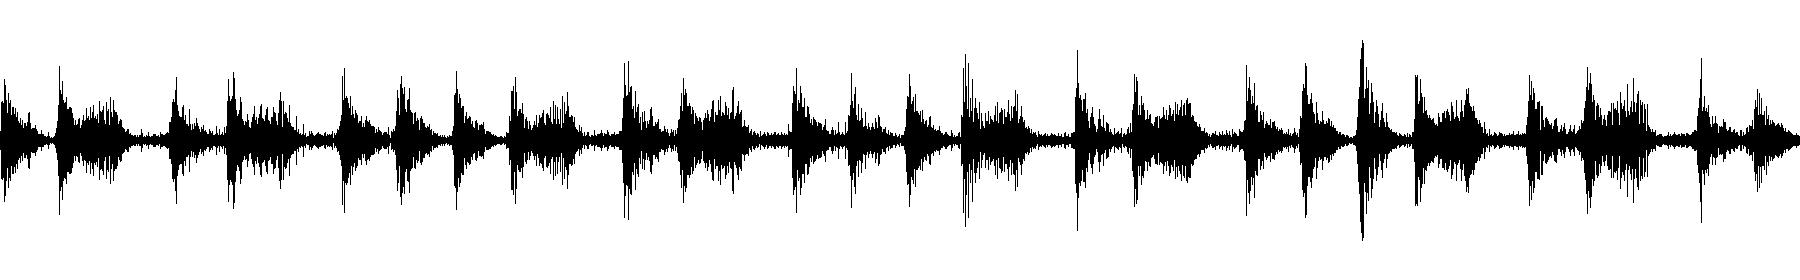 159549 130 bass loop 1 c2 wav